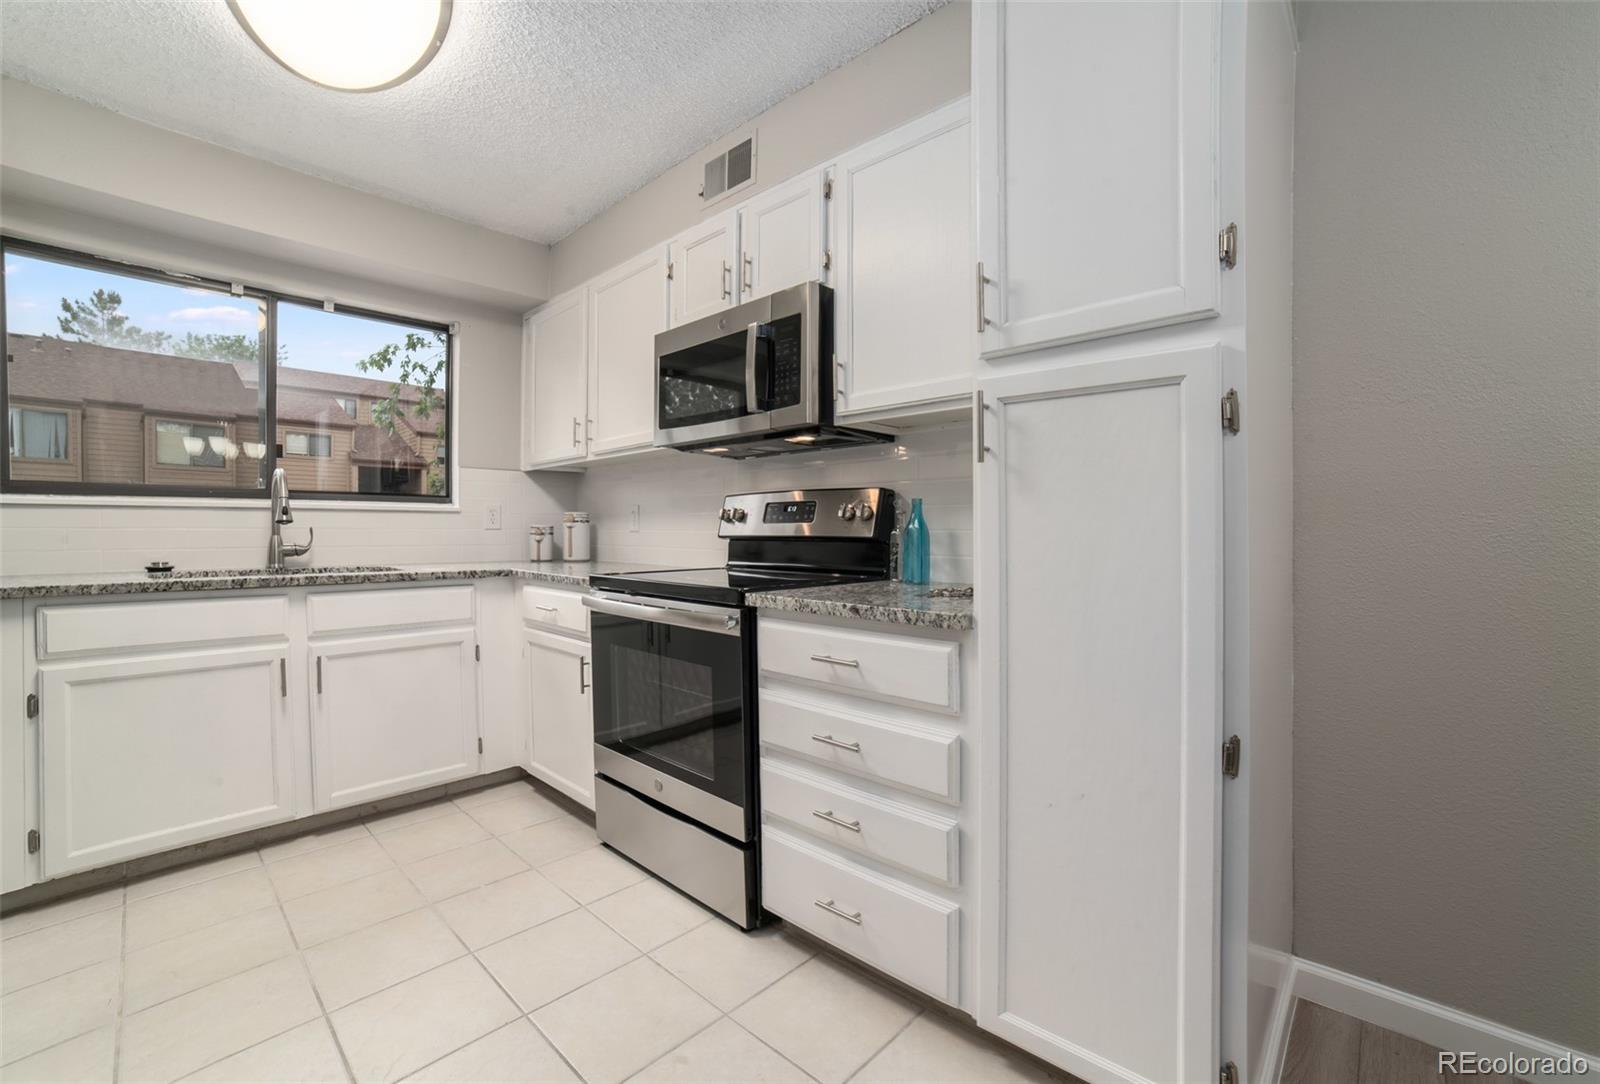 MLS# 8386467 - 7 - 220 Wright Street #203, Lakewood, CO 80228